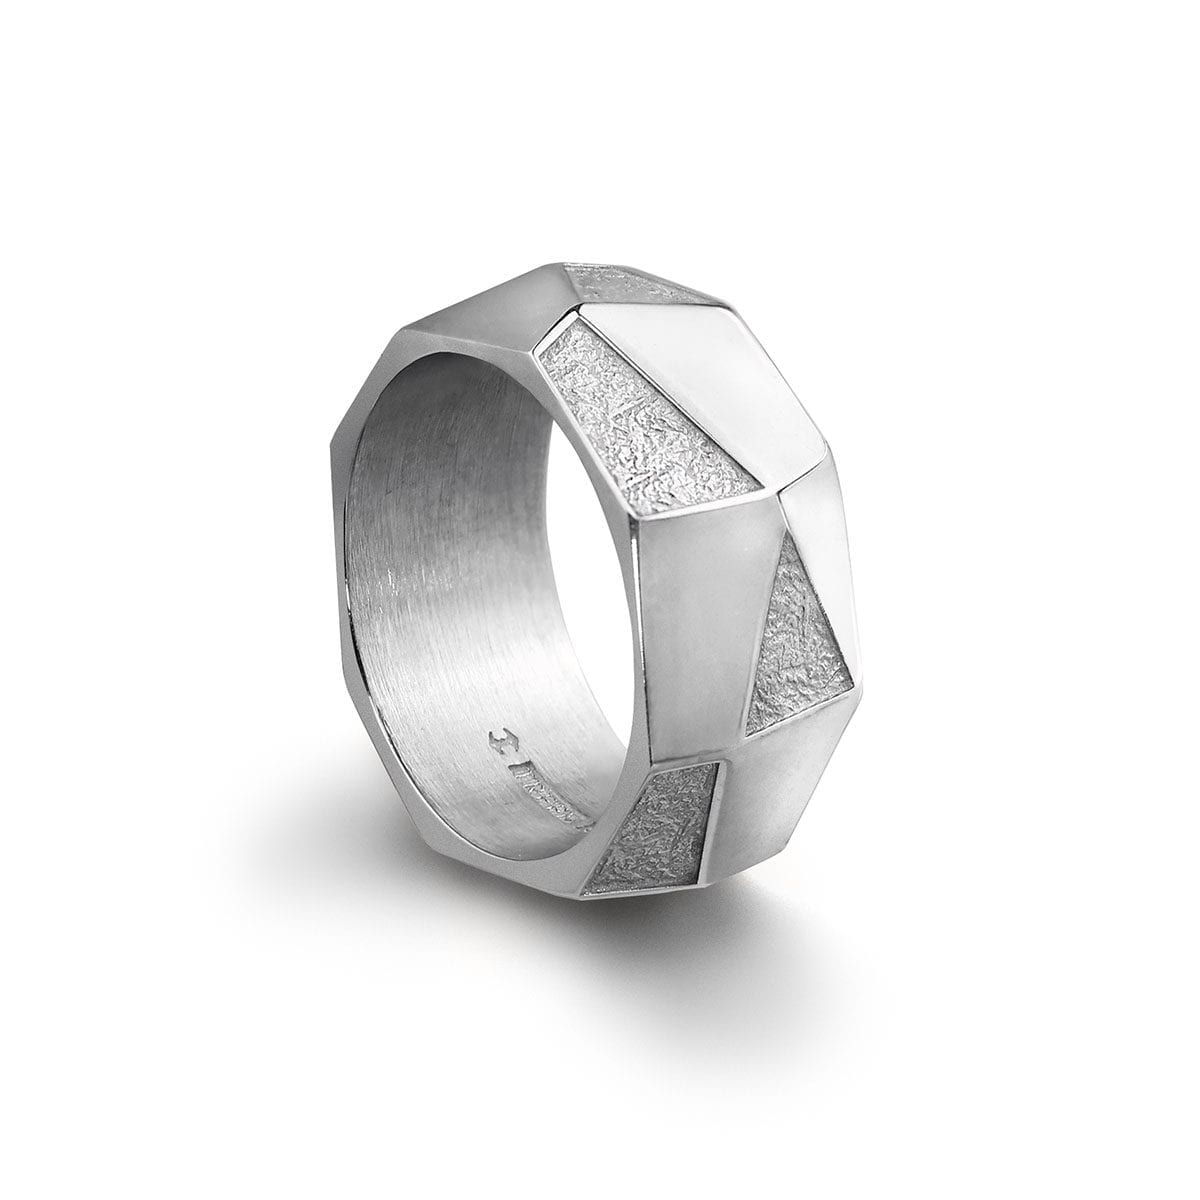 antarktis-ring-silver